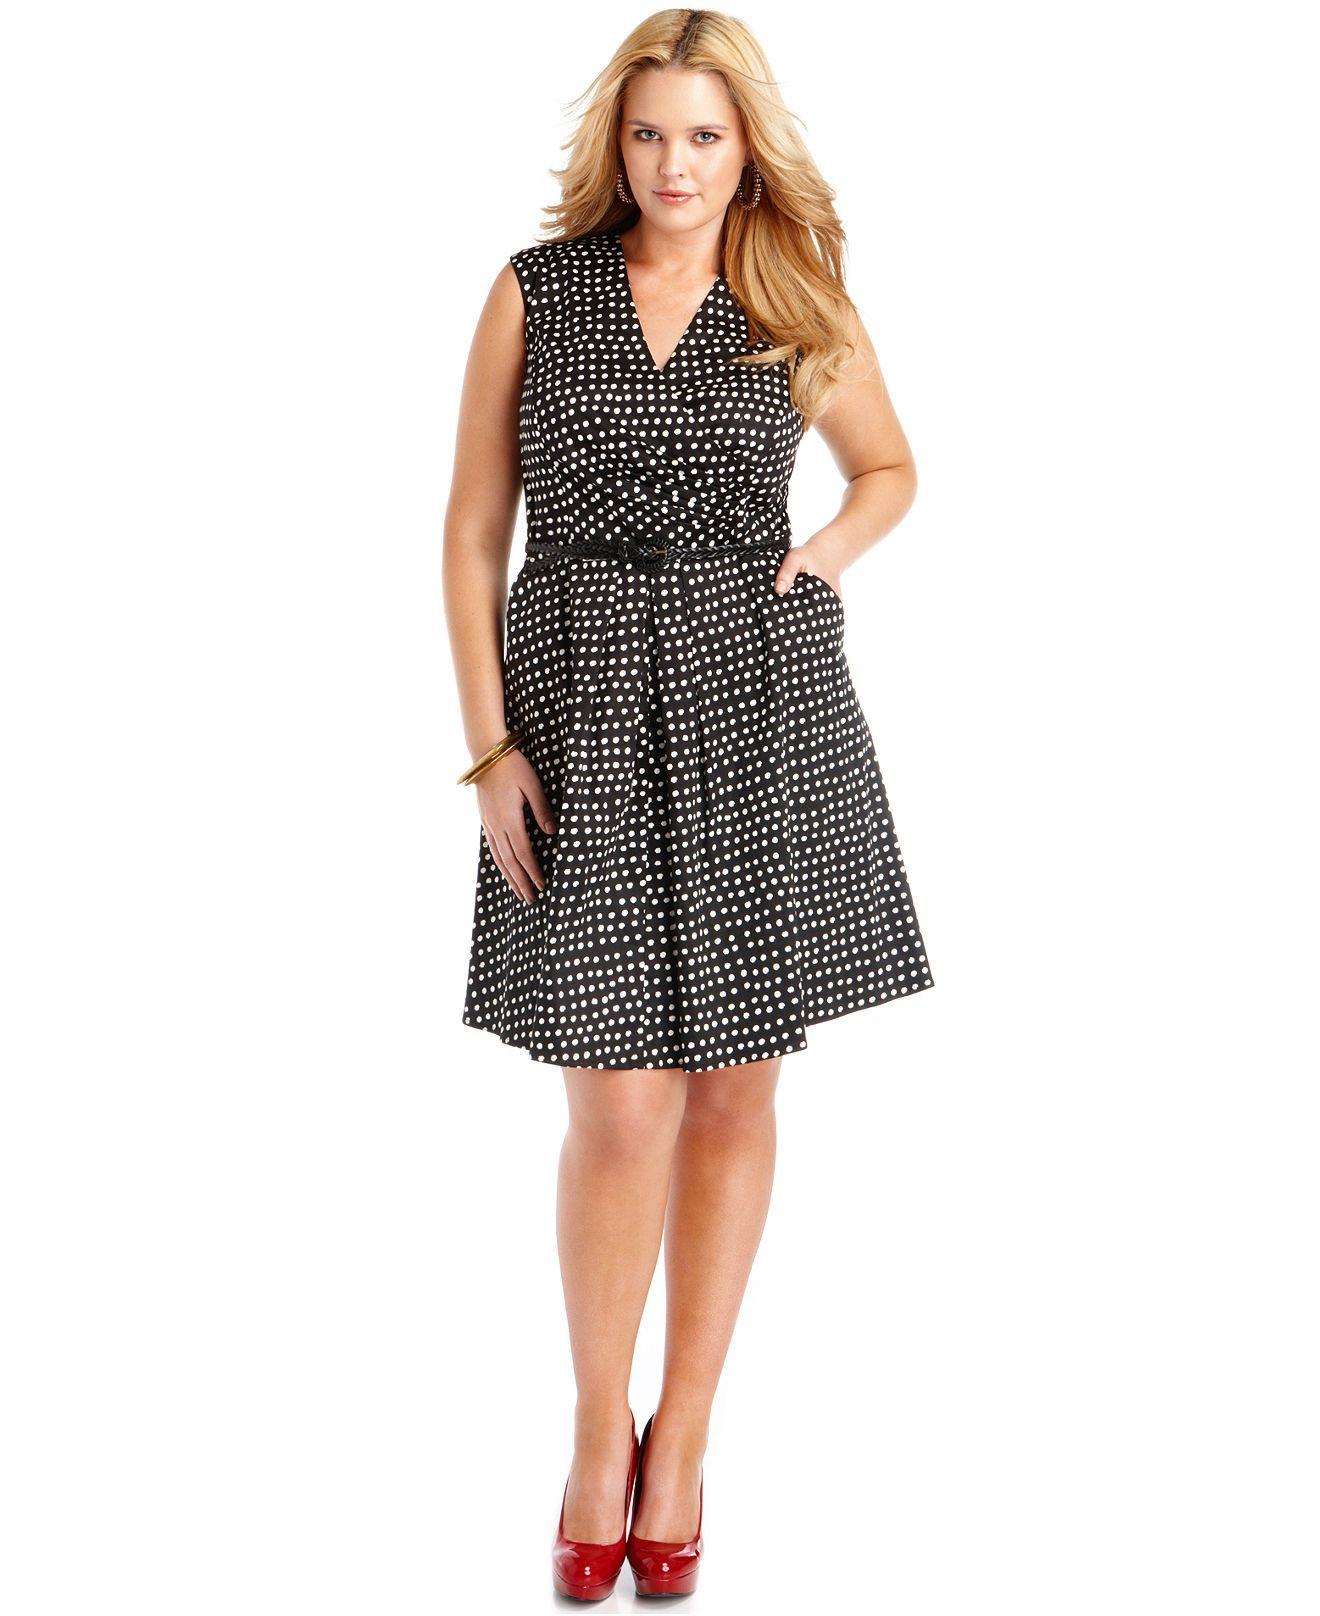 Jessica simpson plus size dress vneck polka dot with belt